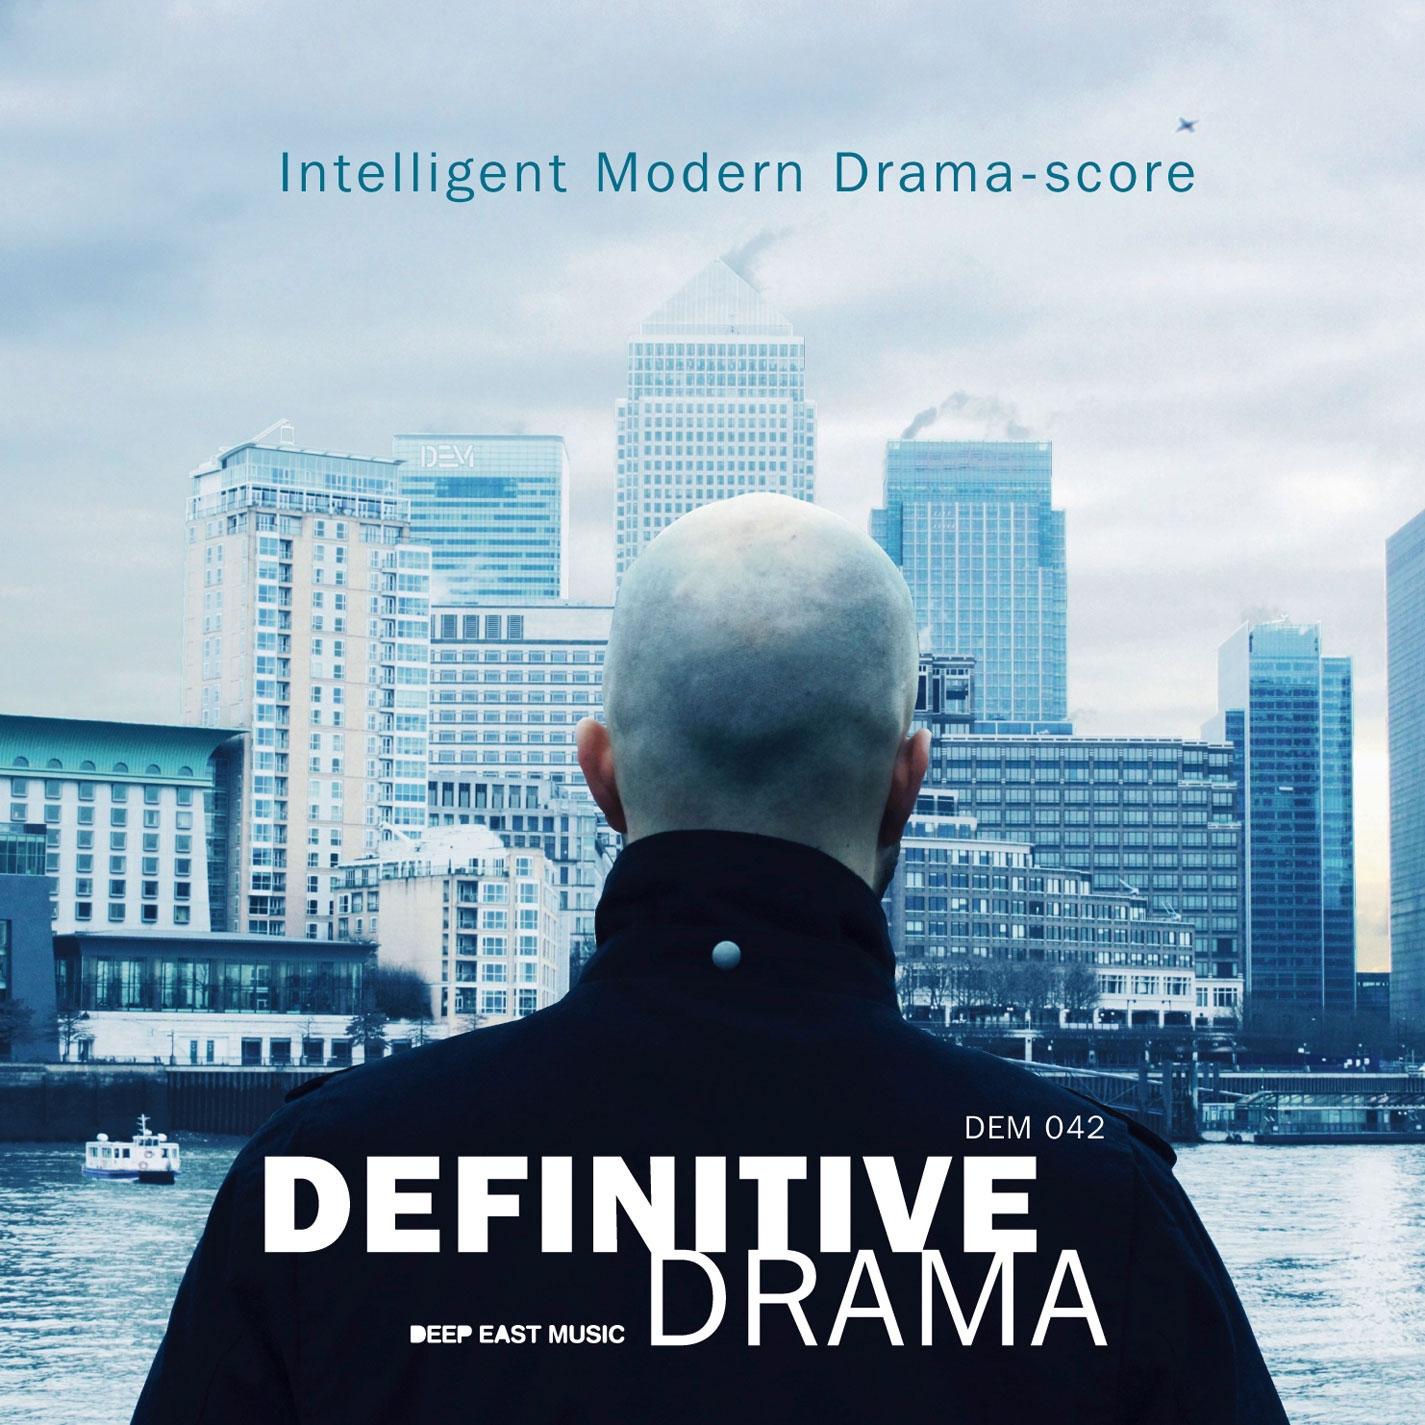 Definitive Drama